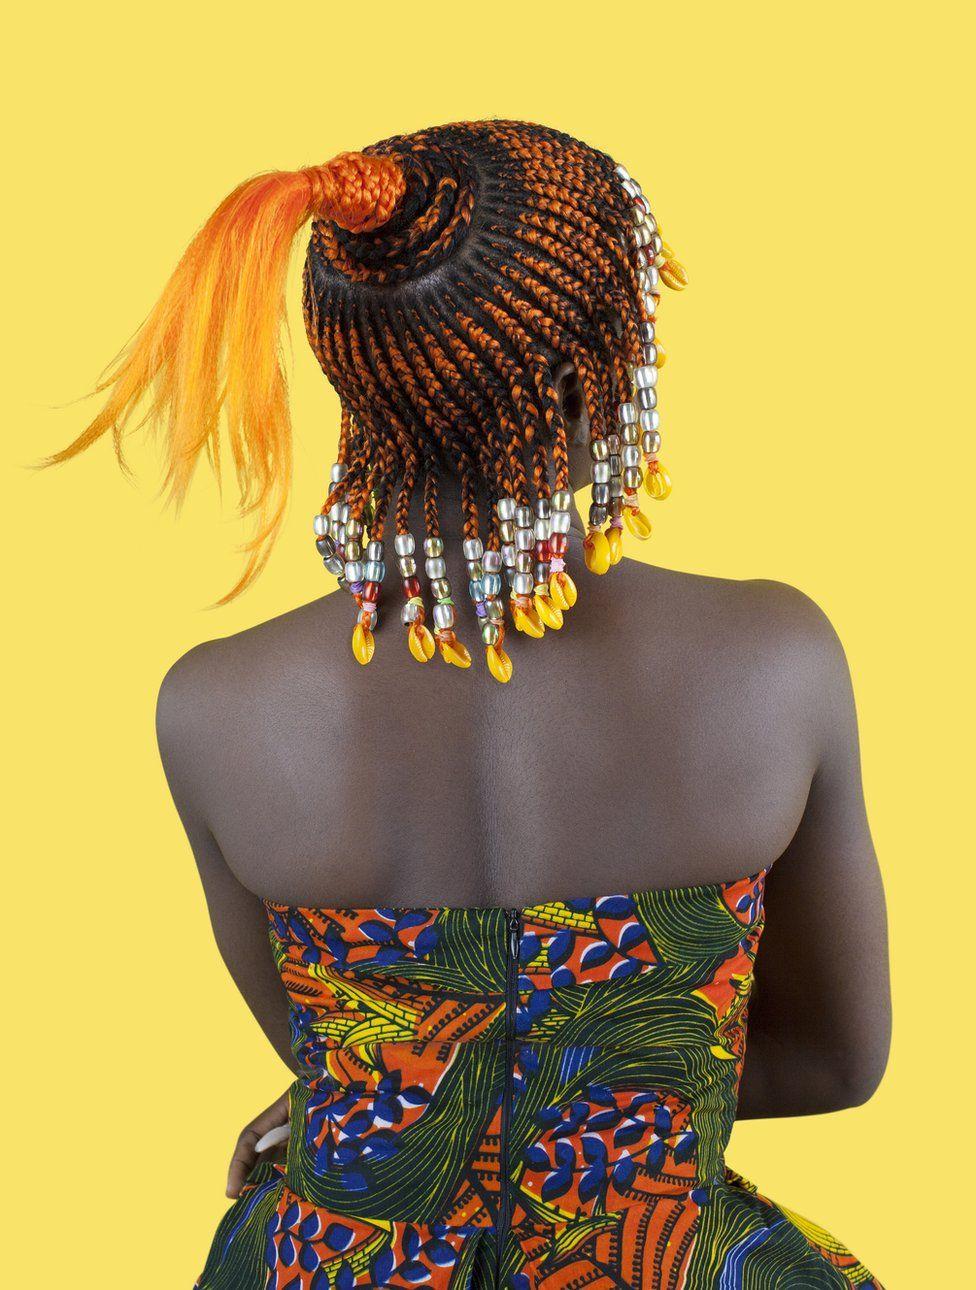 Portrait by Medina Dugger showing African hair braiding